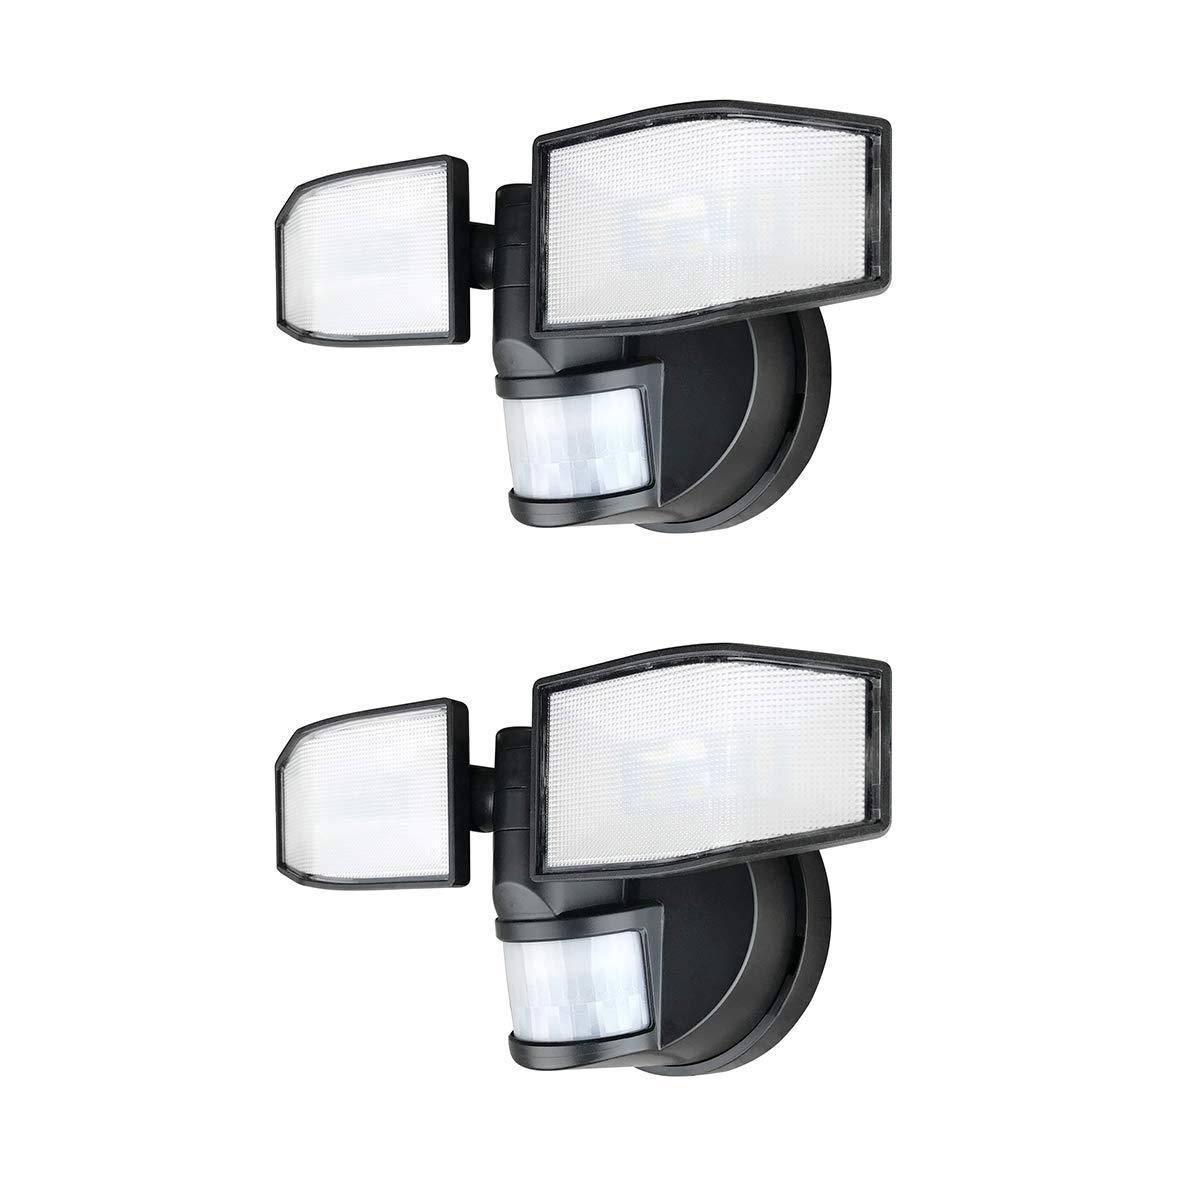 buy popular 600aa 55f8a Details about 2 Pack Xtralite NiteSafe X2 Twin LED Floodlight Wireless  Motion Sensor Light